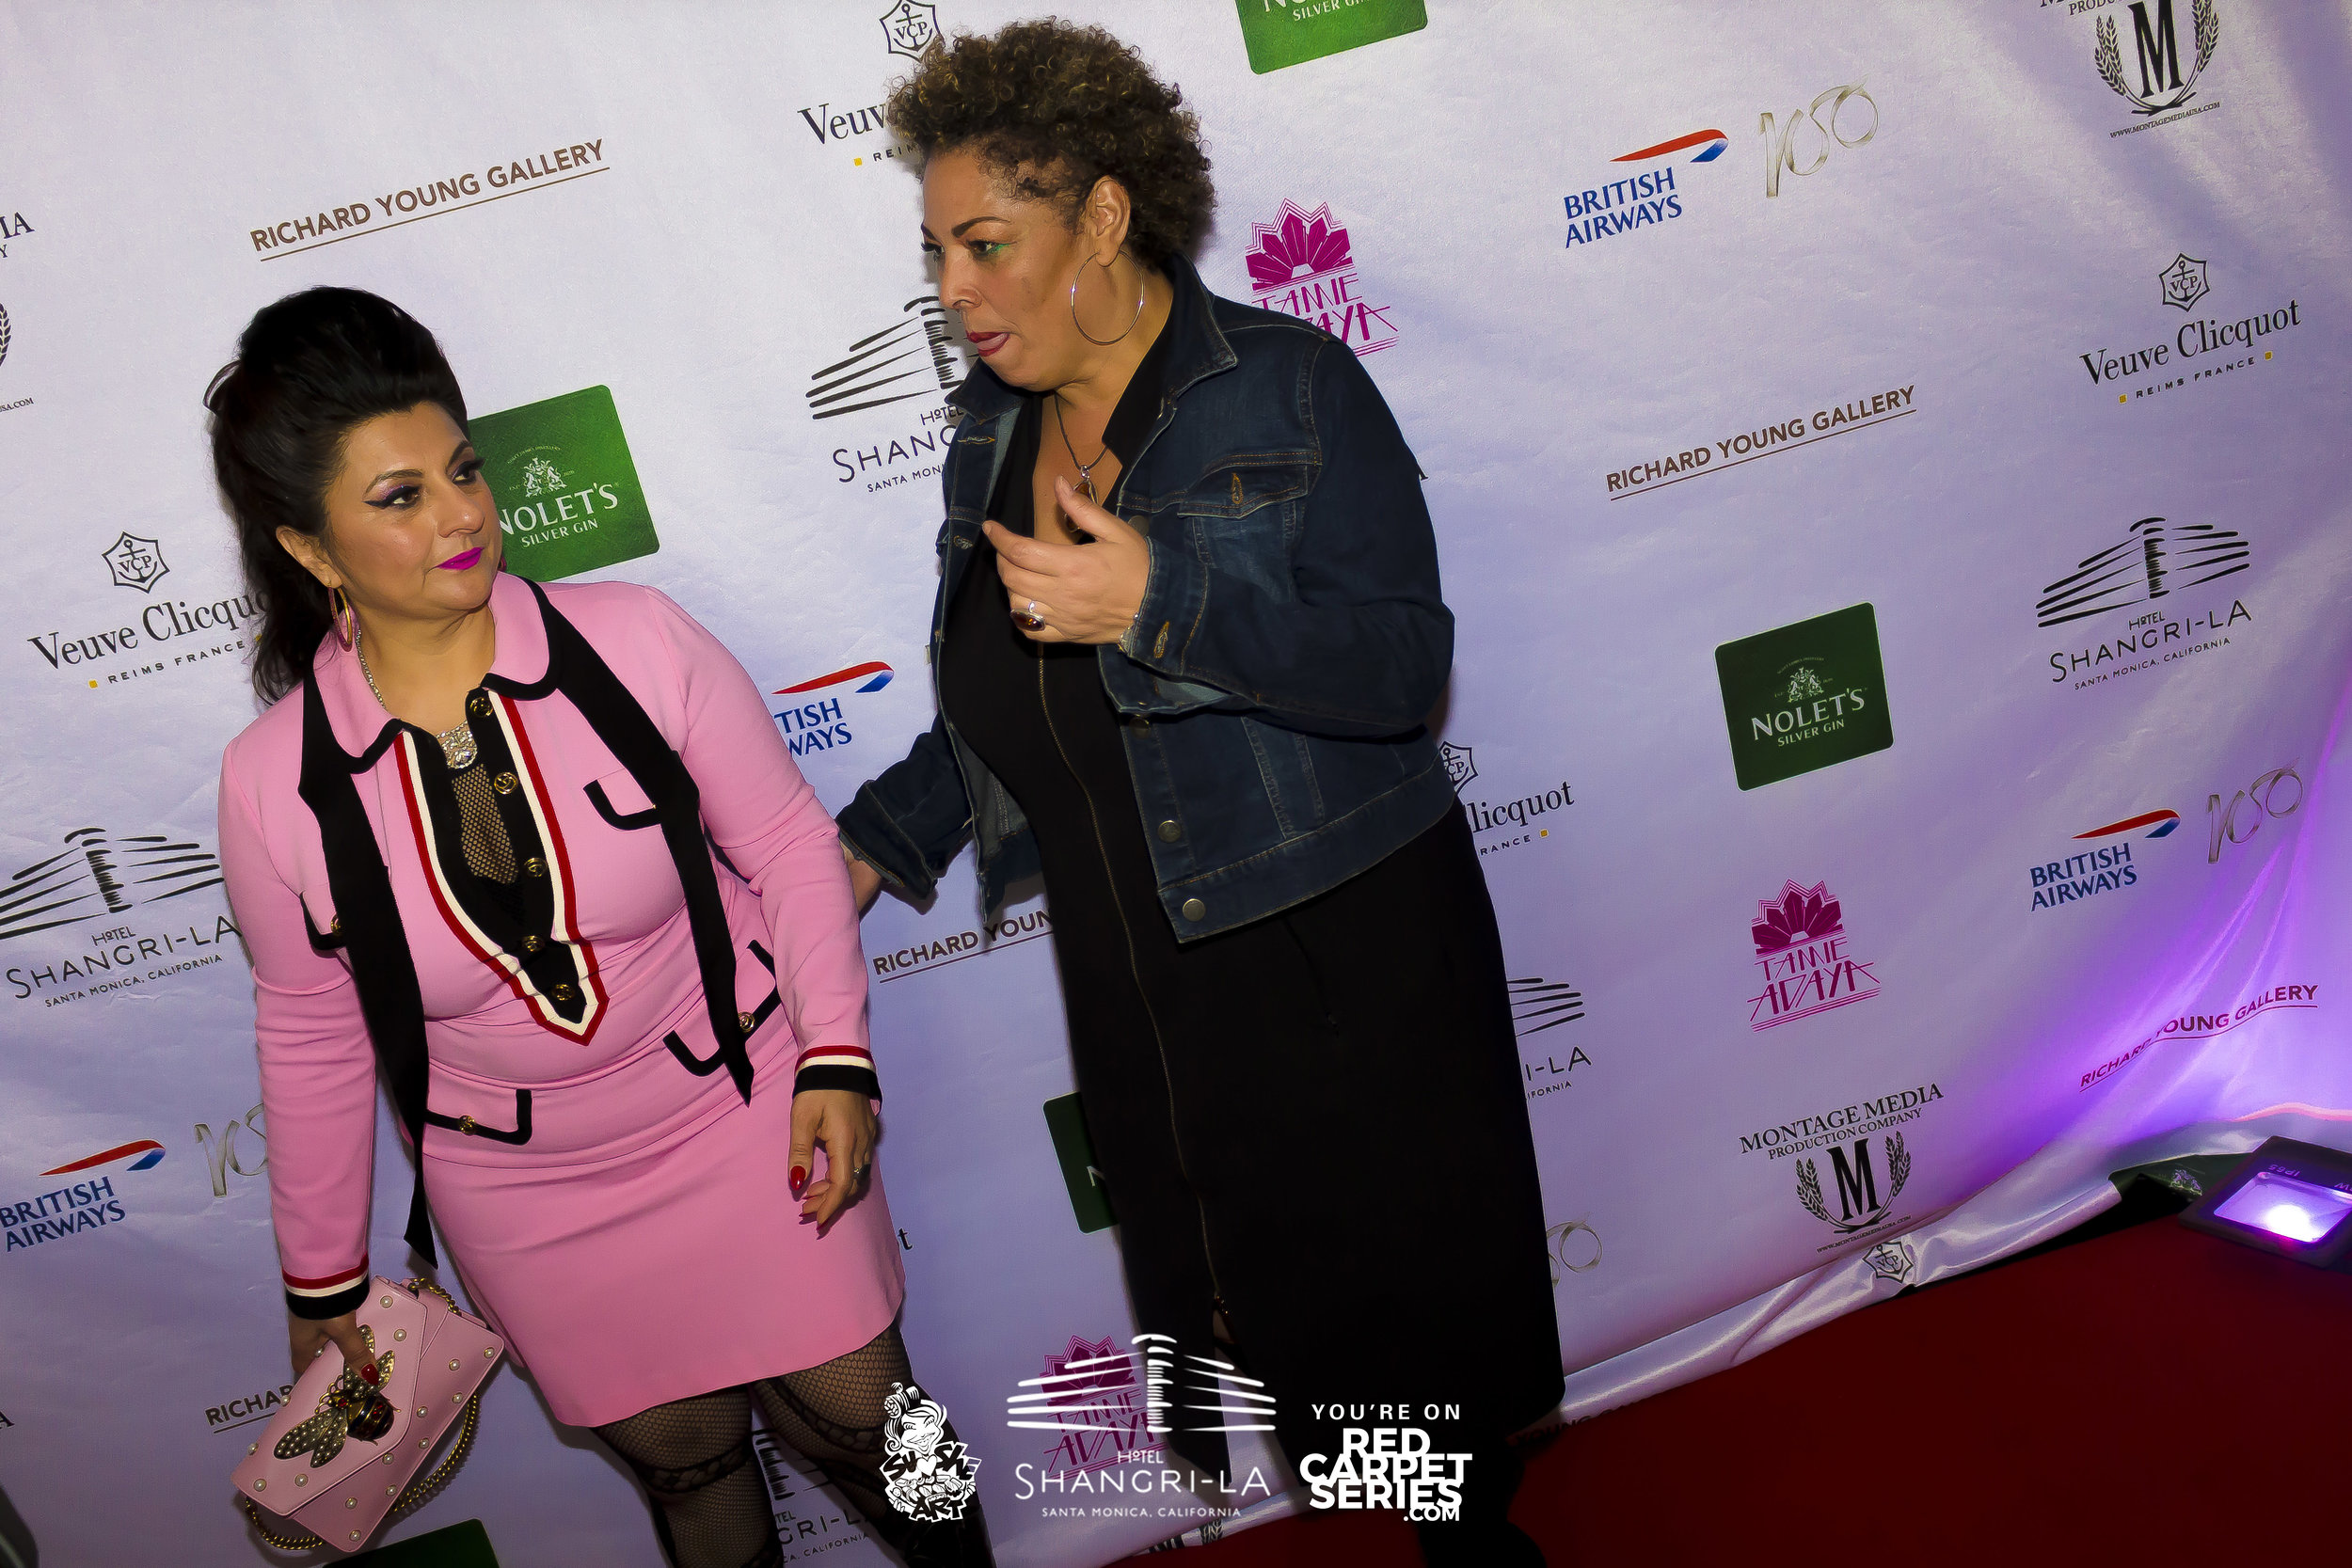 Shangri-la Diamond Jubilee - 03-11-19_11.jpg